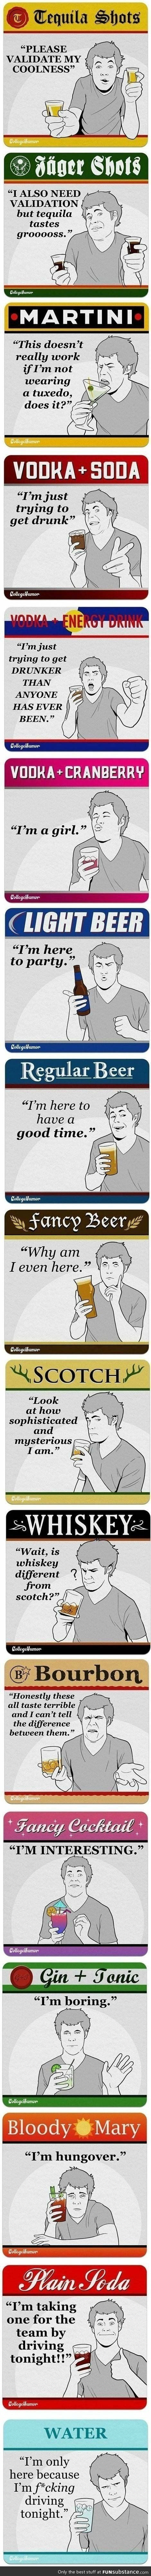 Drinks personalities